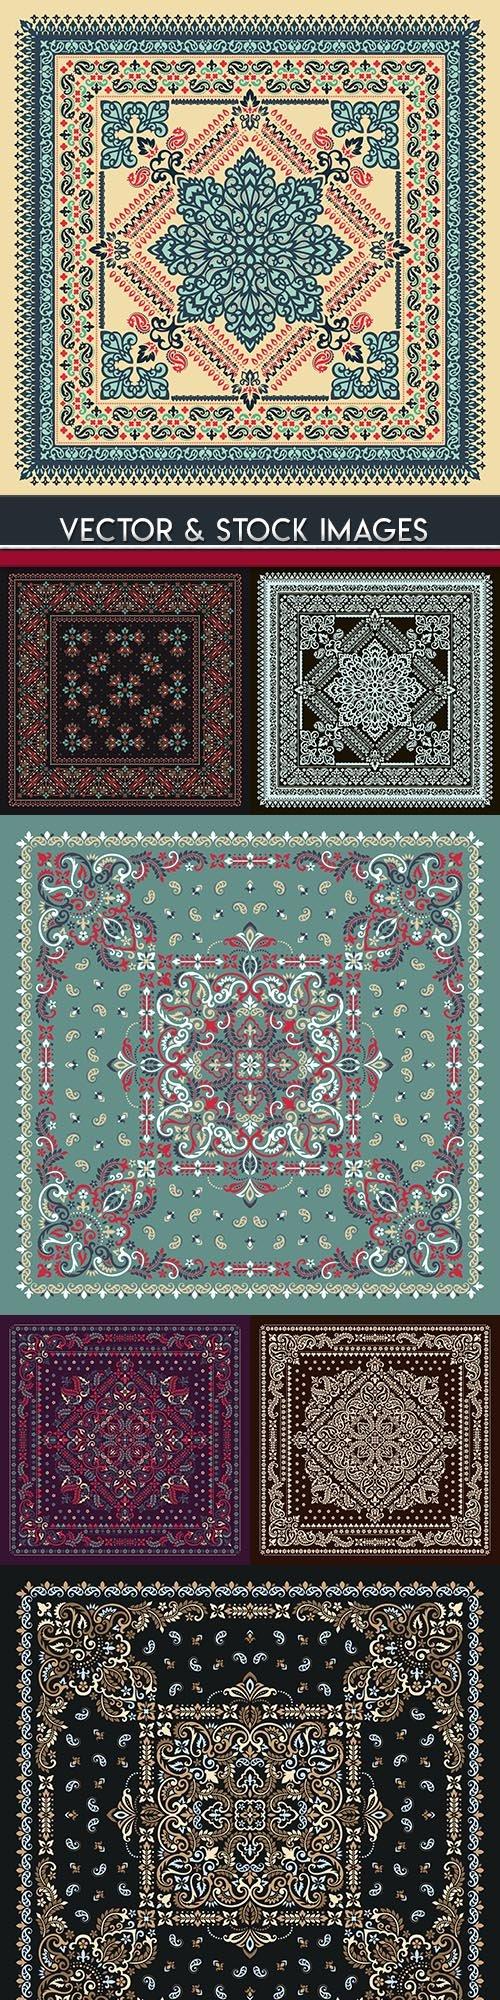 Bandana decorative ornament ethnic elegant fabric